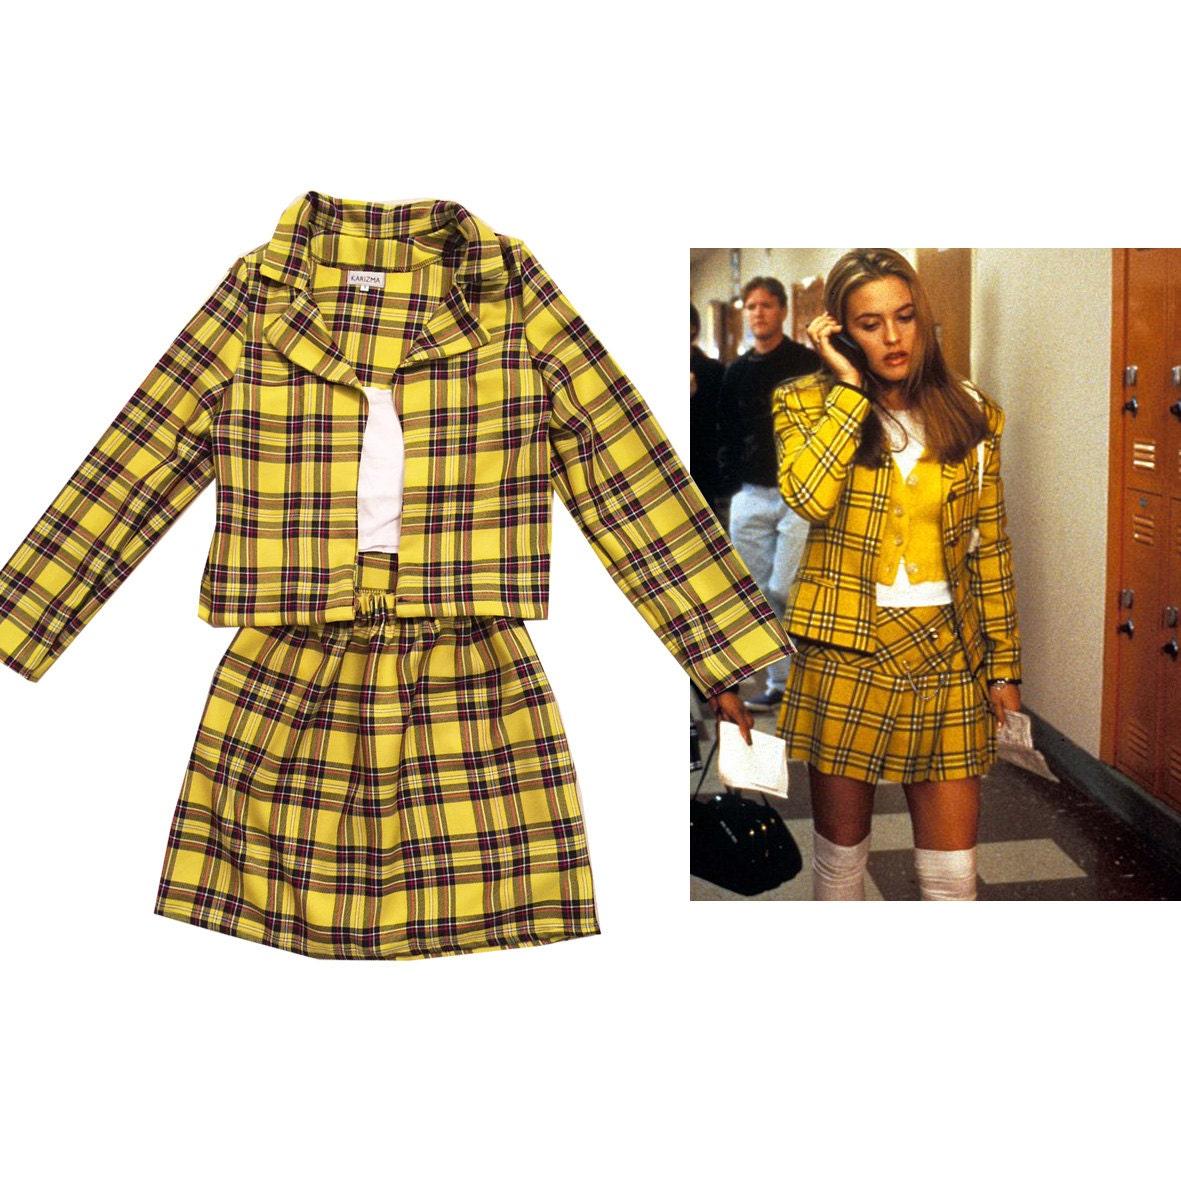 SALE Cheru0026#39;s Clueless Outfit Yellow Tartan Plaid Fancy